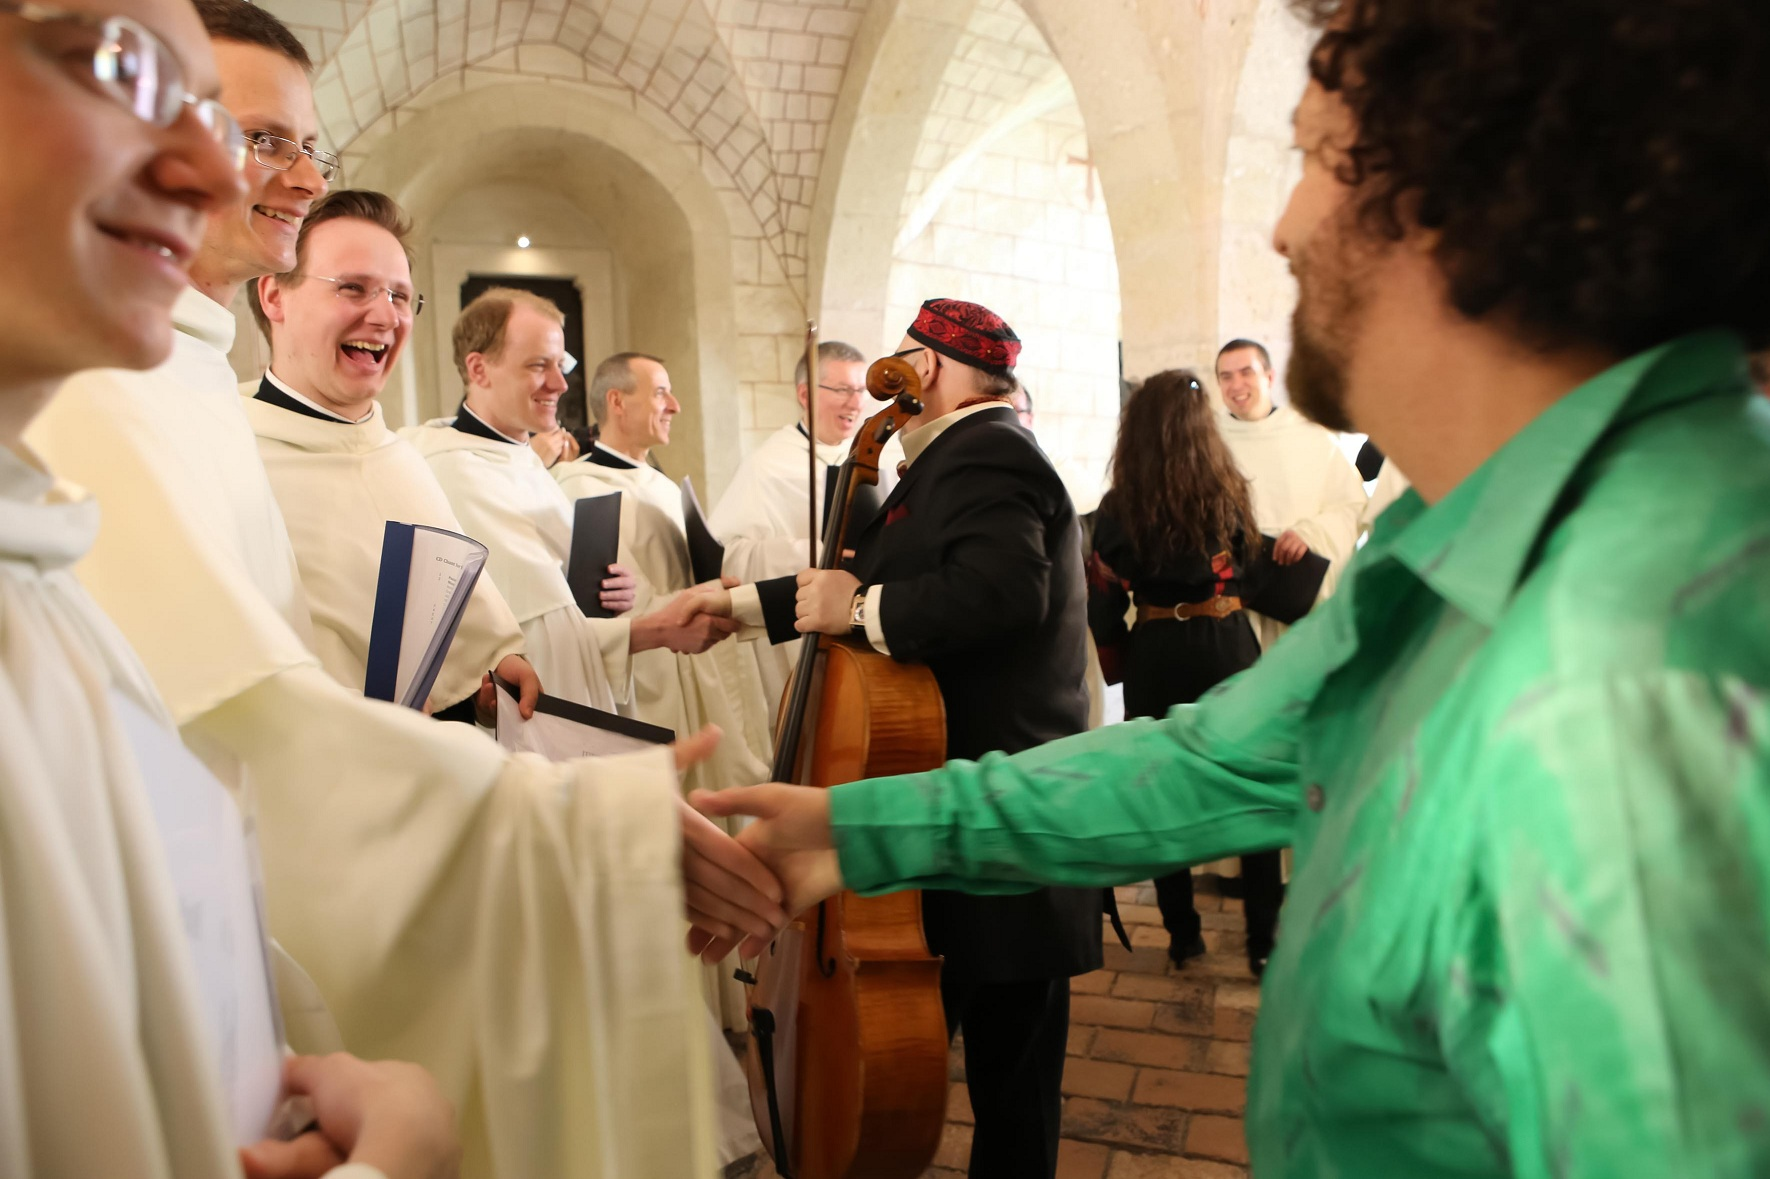 Zisterziensermönche und Elias Meiri bei der Produktion der CD Chant for Peace. Fotocredit: DG/Andreas Lepsi